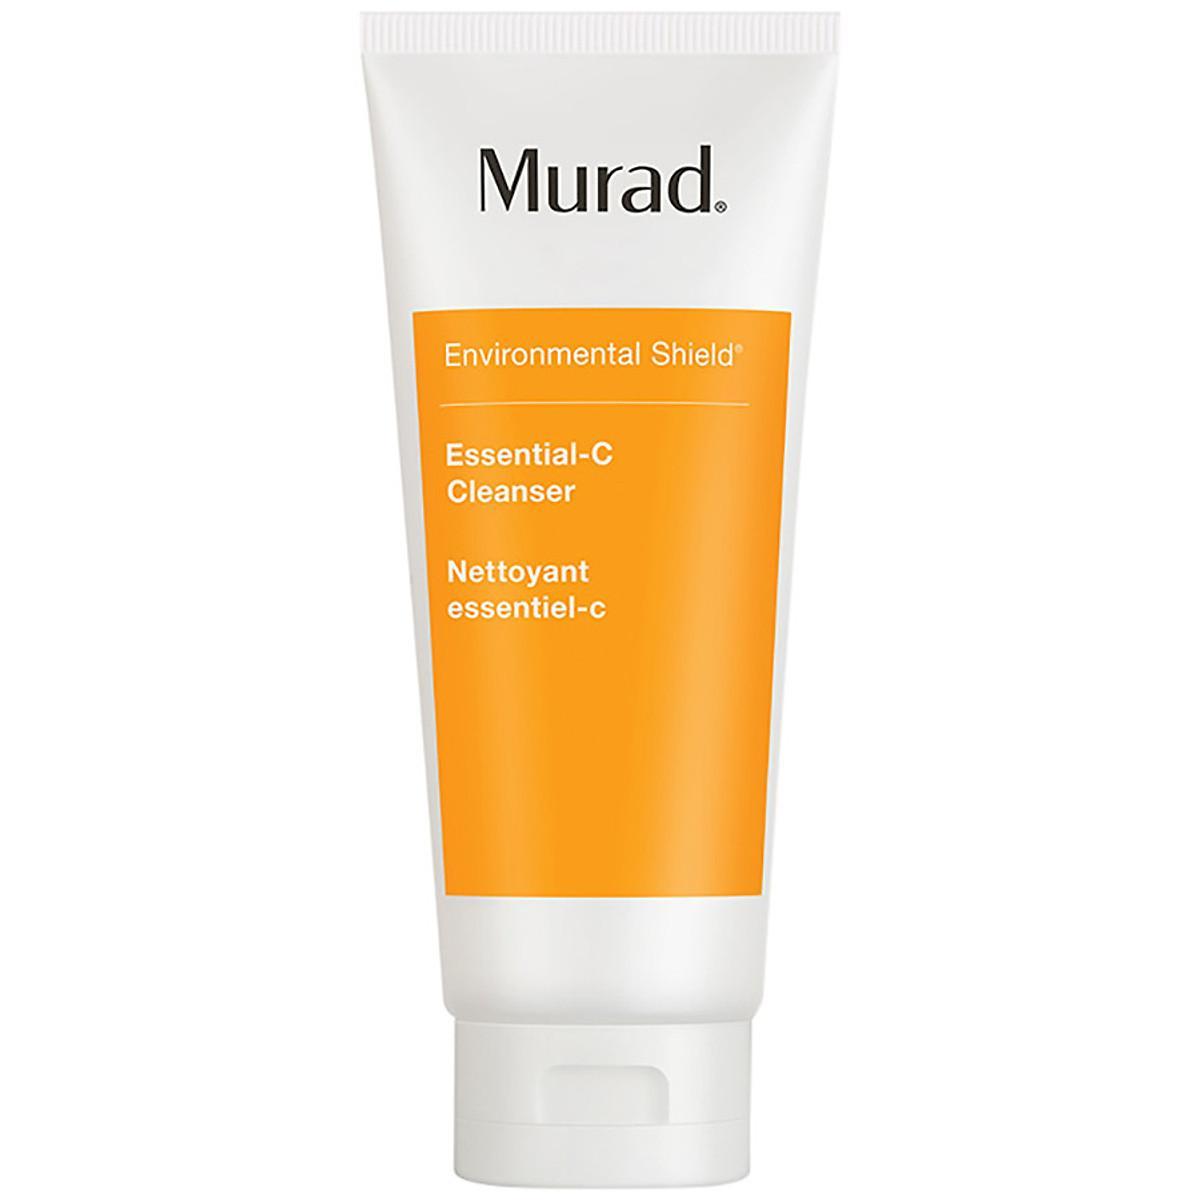 Đánh giá chi tiết Sữa rửa mặt Murad Essential C Cleanser